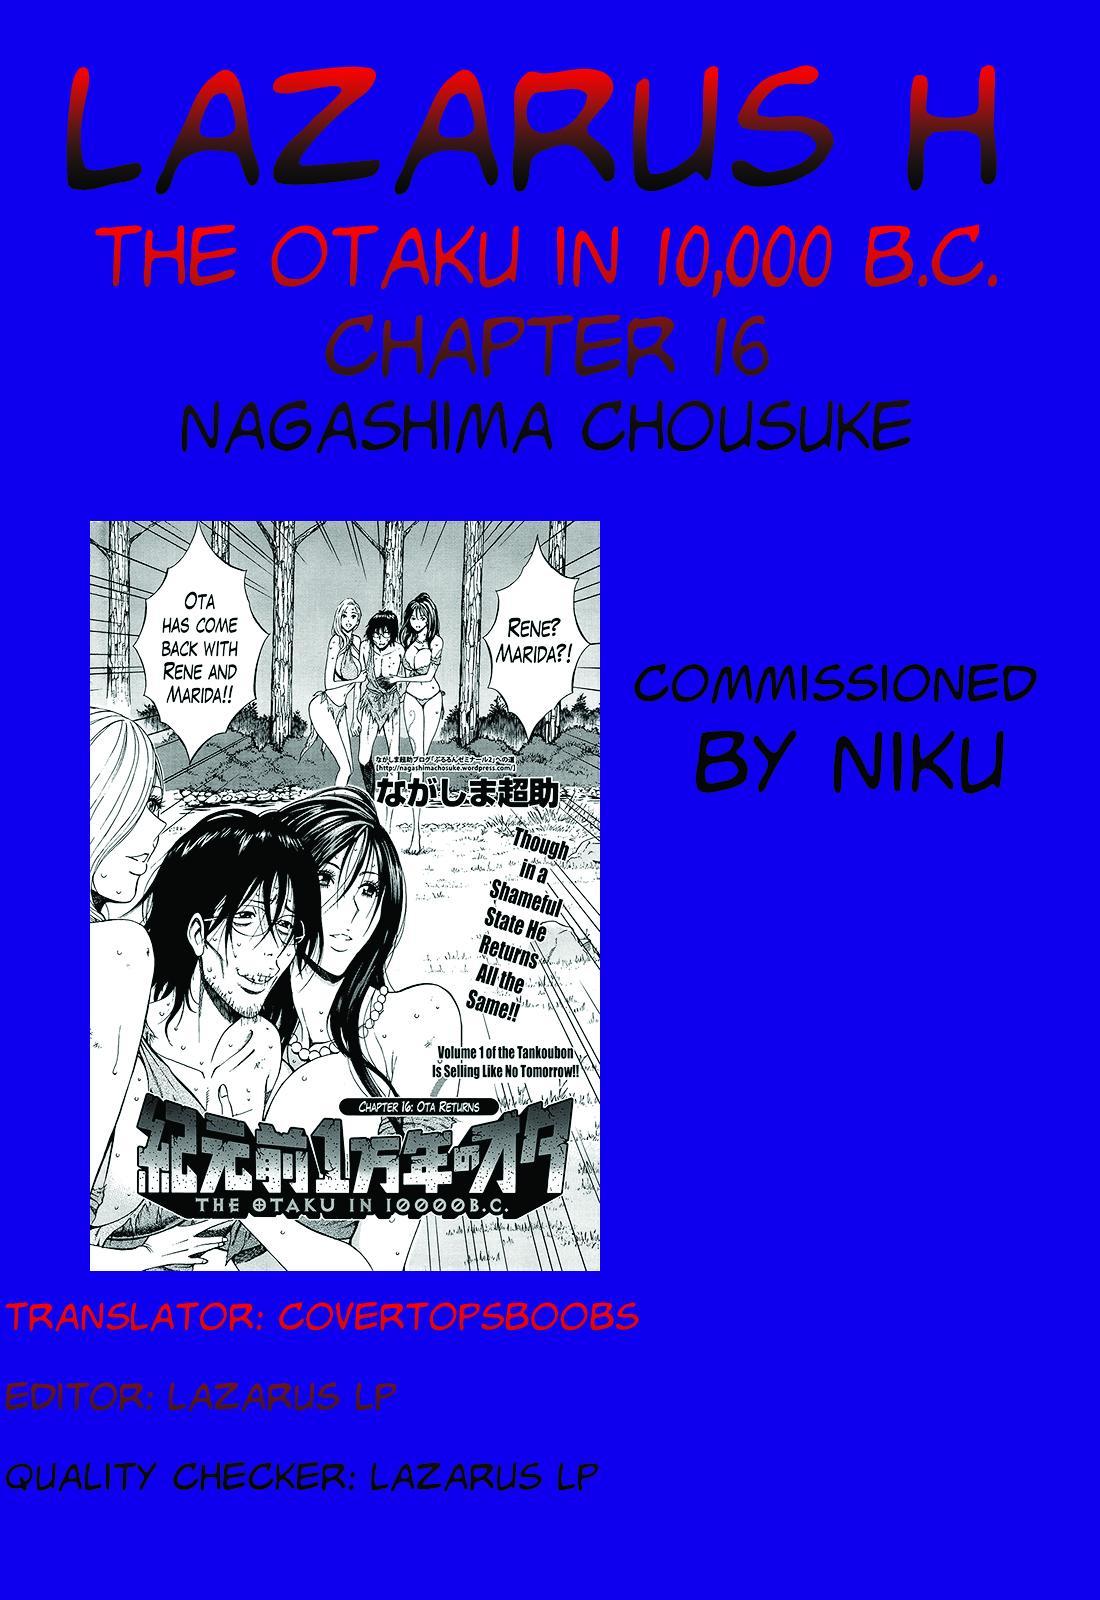 Kigenzen 10000 Nen no Ota | The Otaku in 10,000 B.C. 308